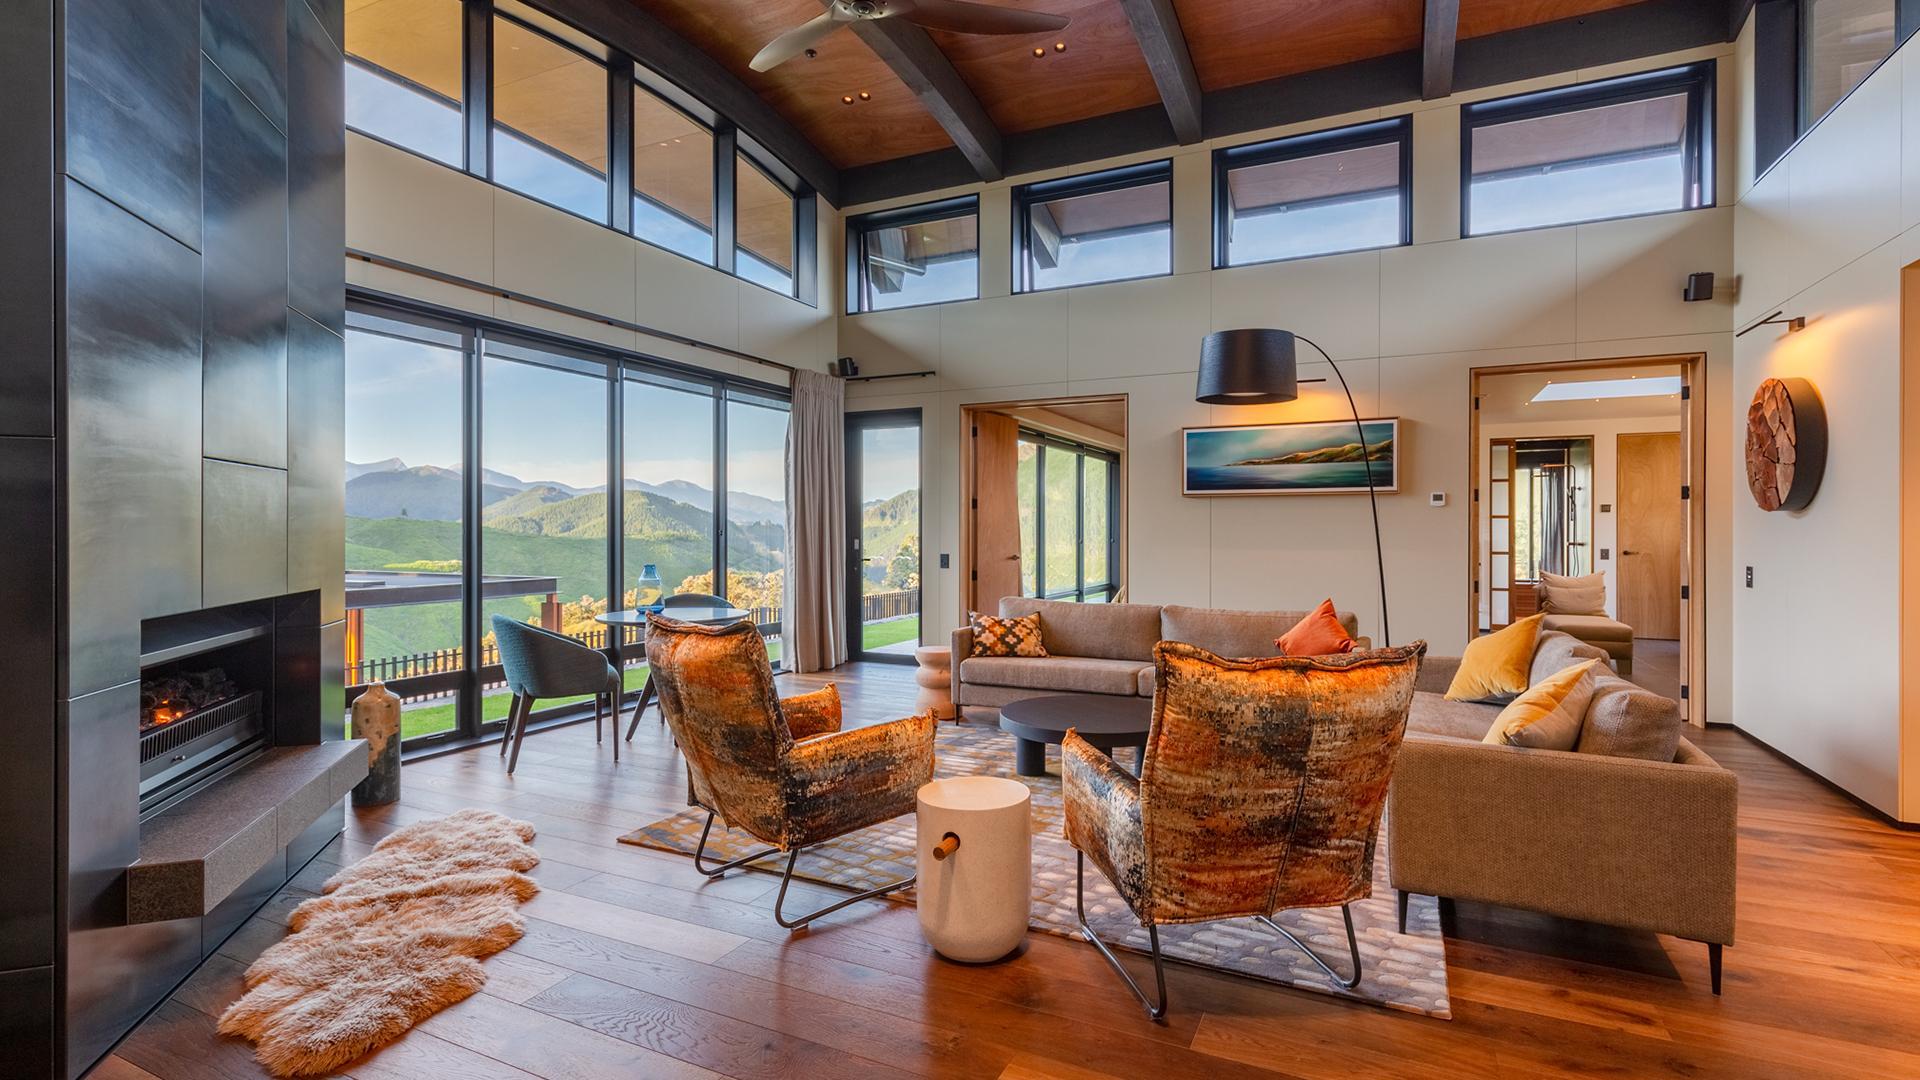 Tasman Suite image 1 at Falcon Brae Villa by null, Tasman, New Zealand